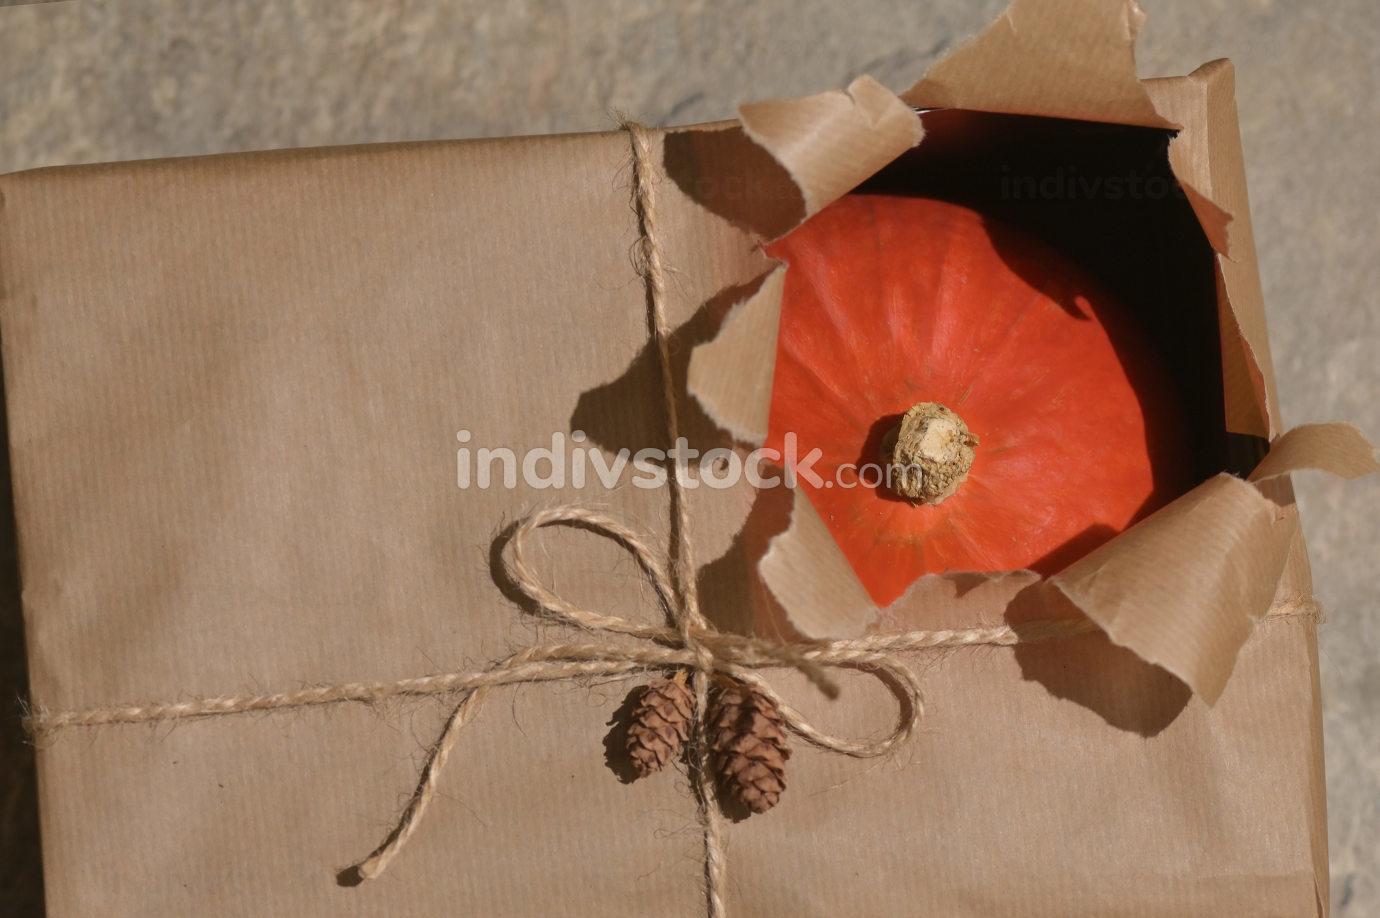 Autumn Pumpkin with Open Present Gift Box